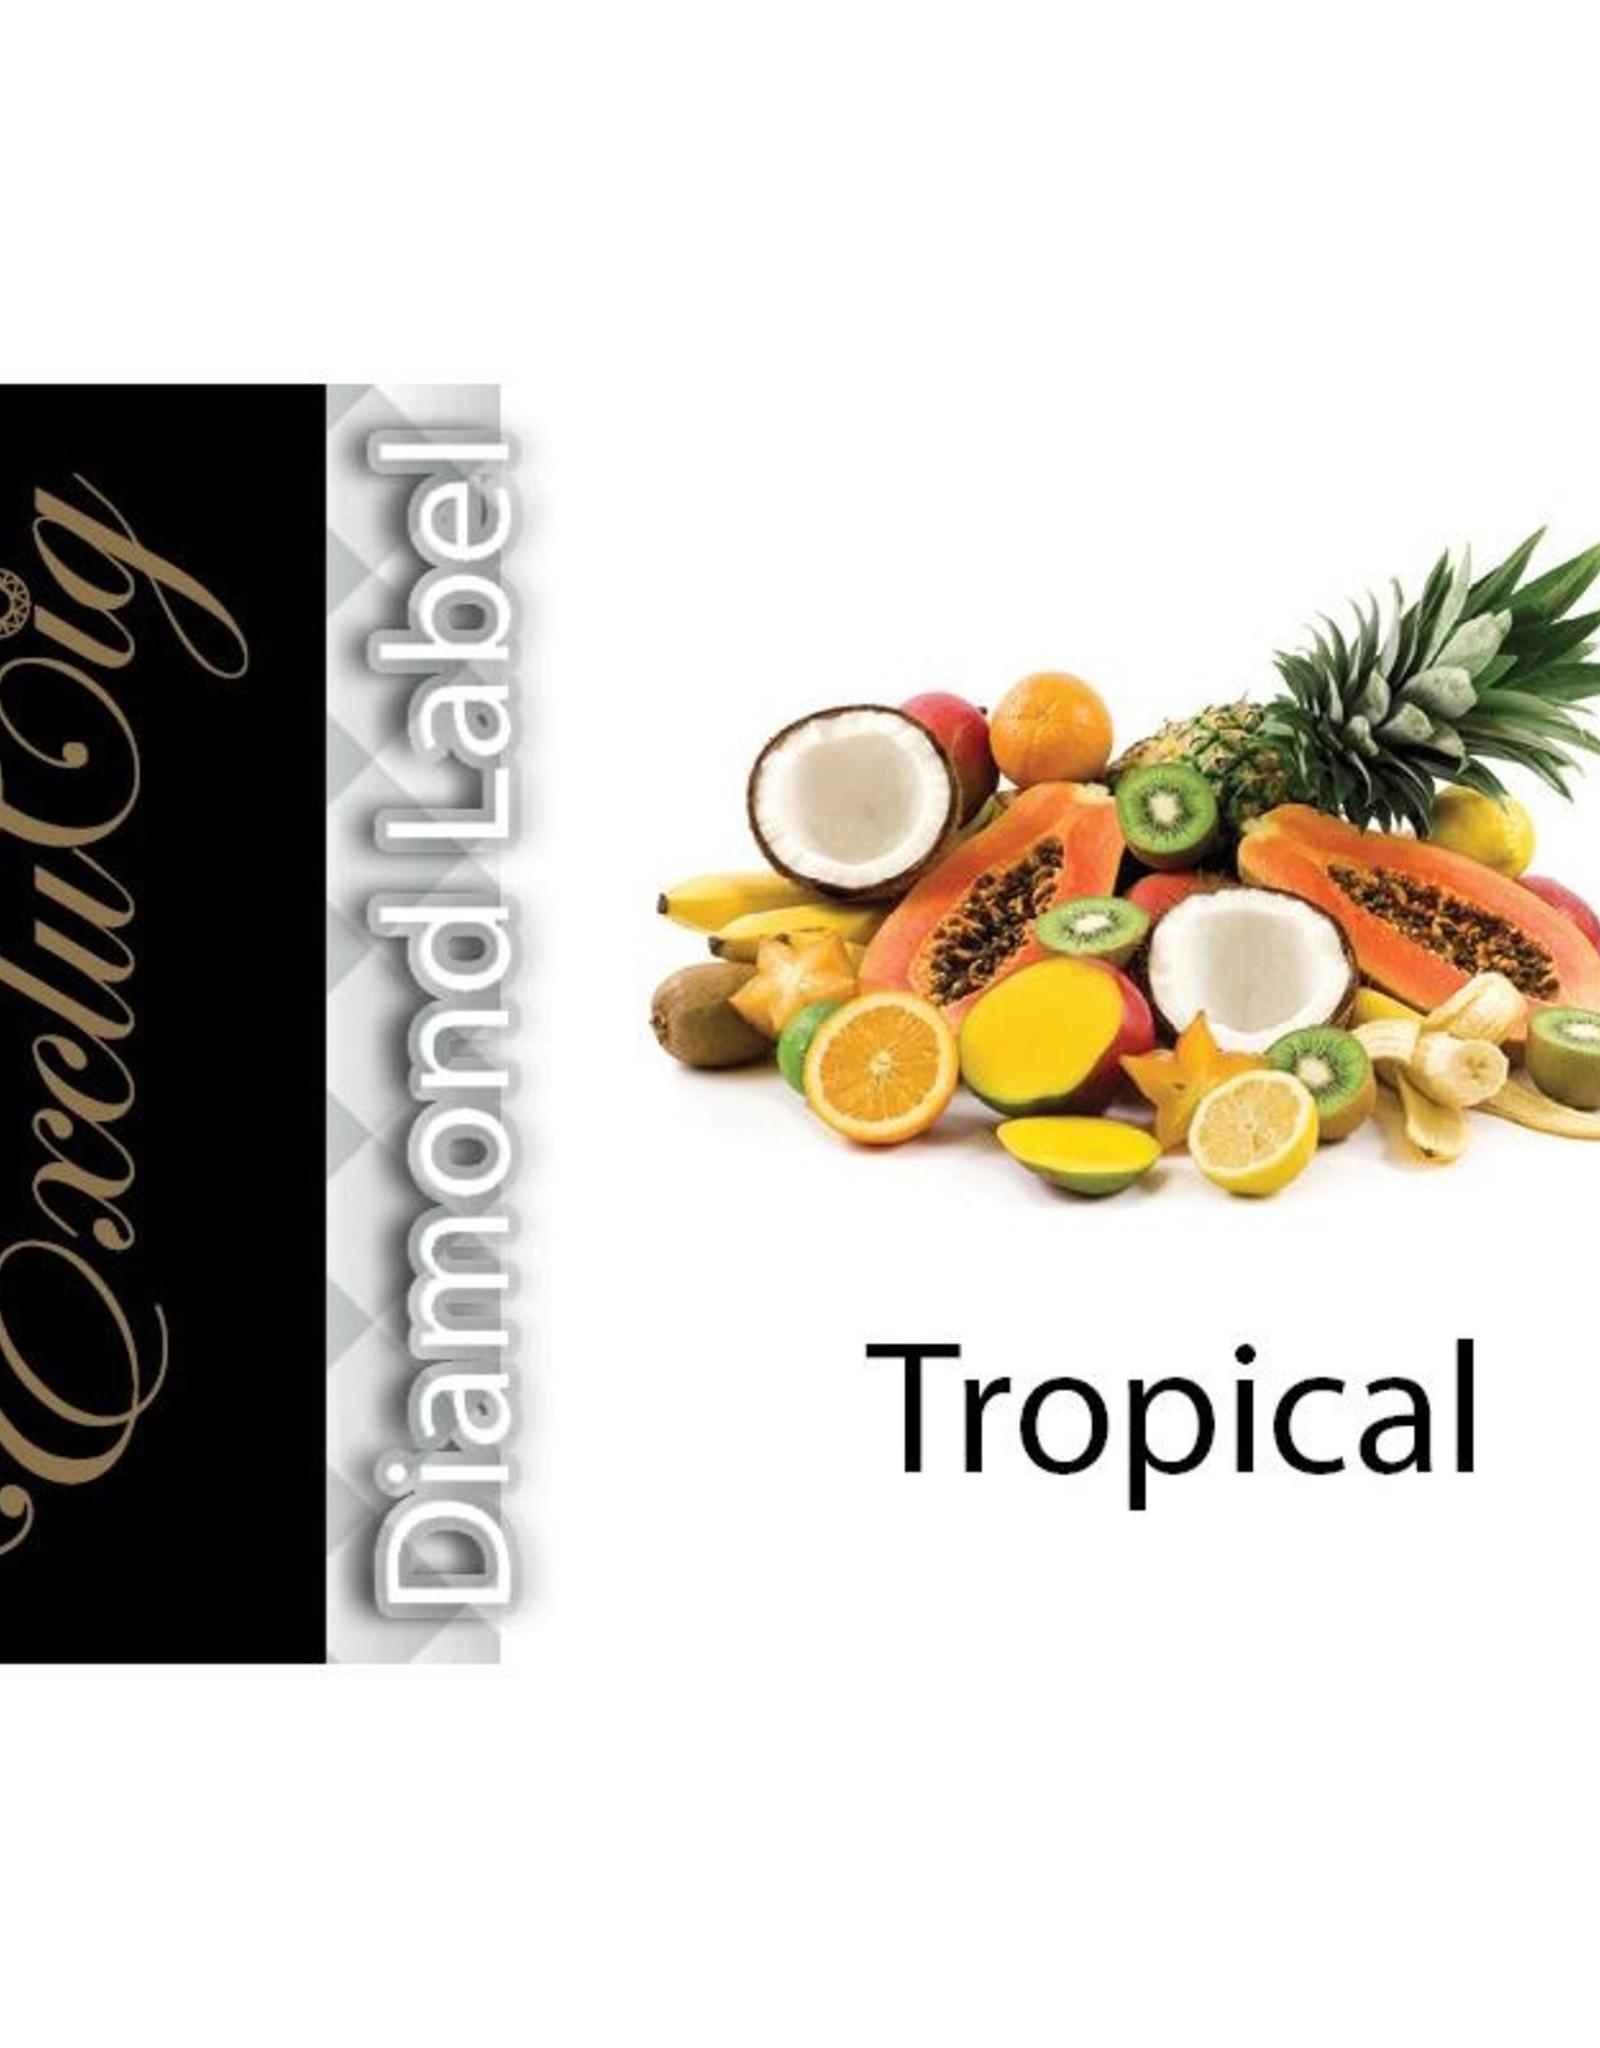 Exclucig Exclucig Diamond Label E-liquid Tropical 6 mg Nicotine